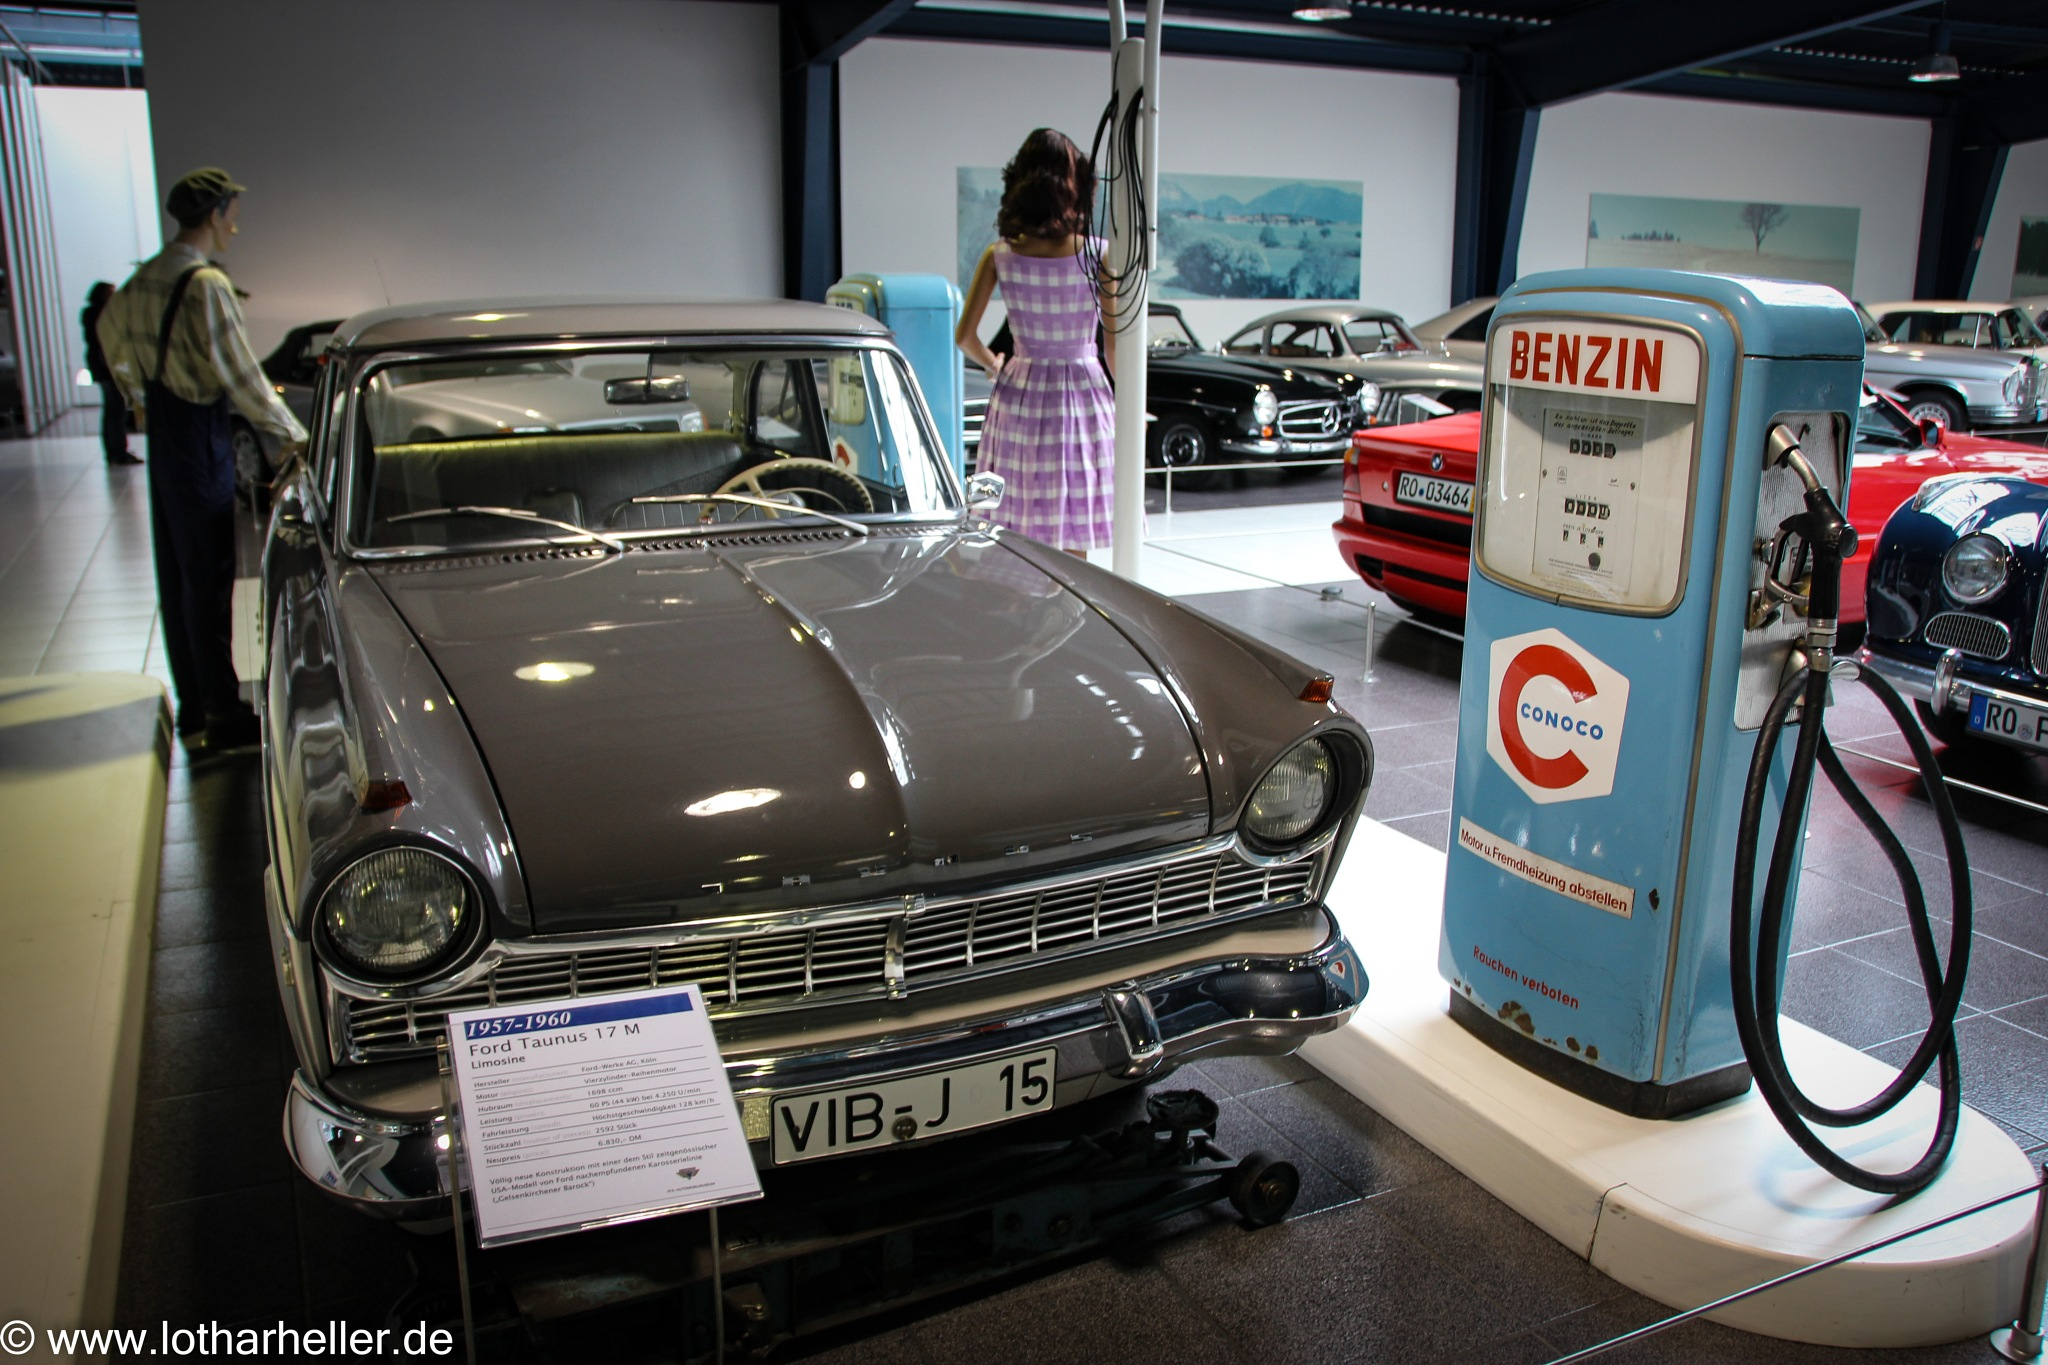 Ford Taunus 17m by Lothar Heller